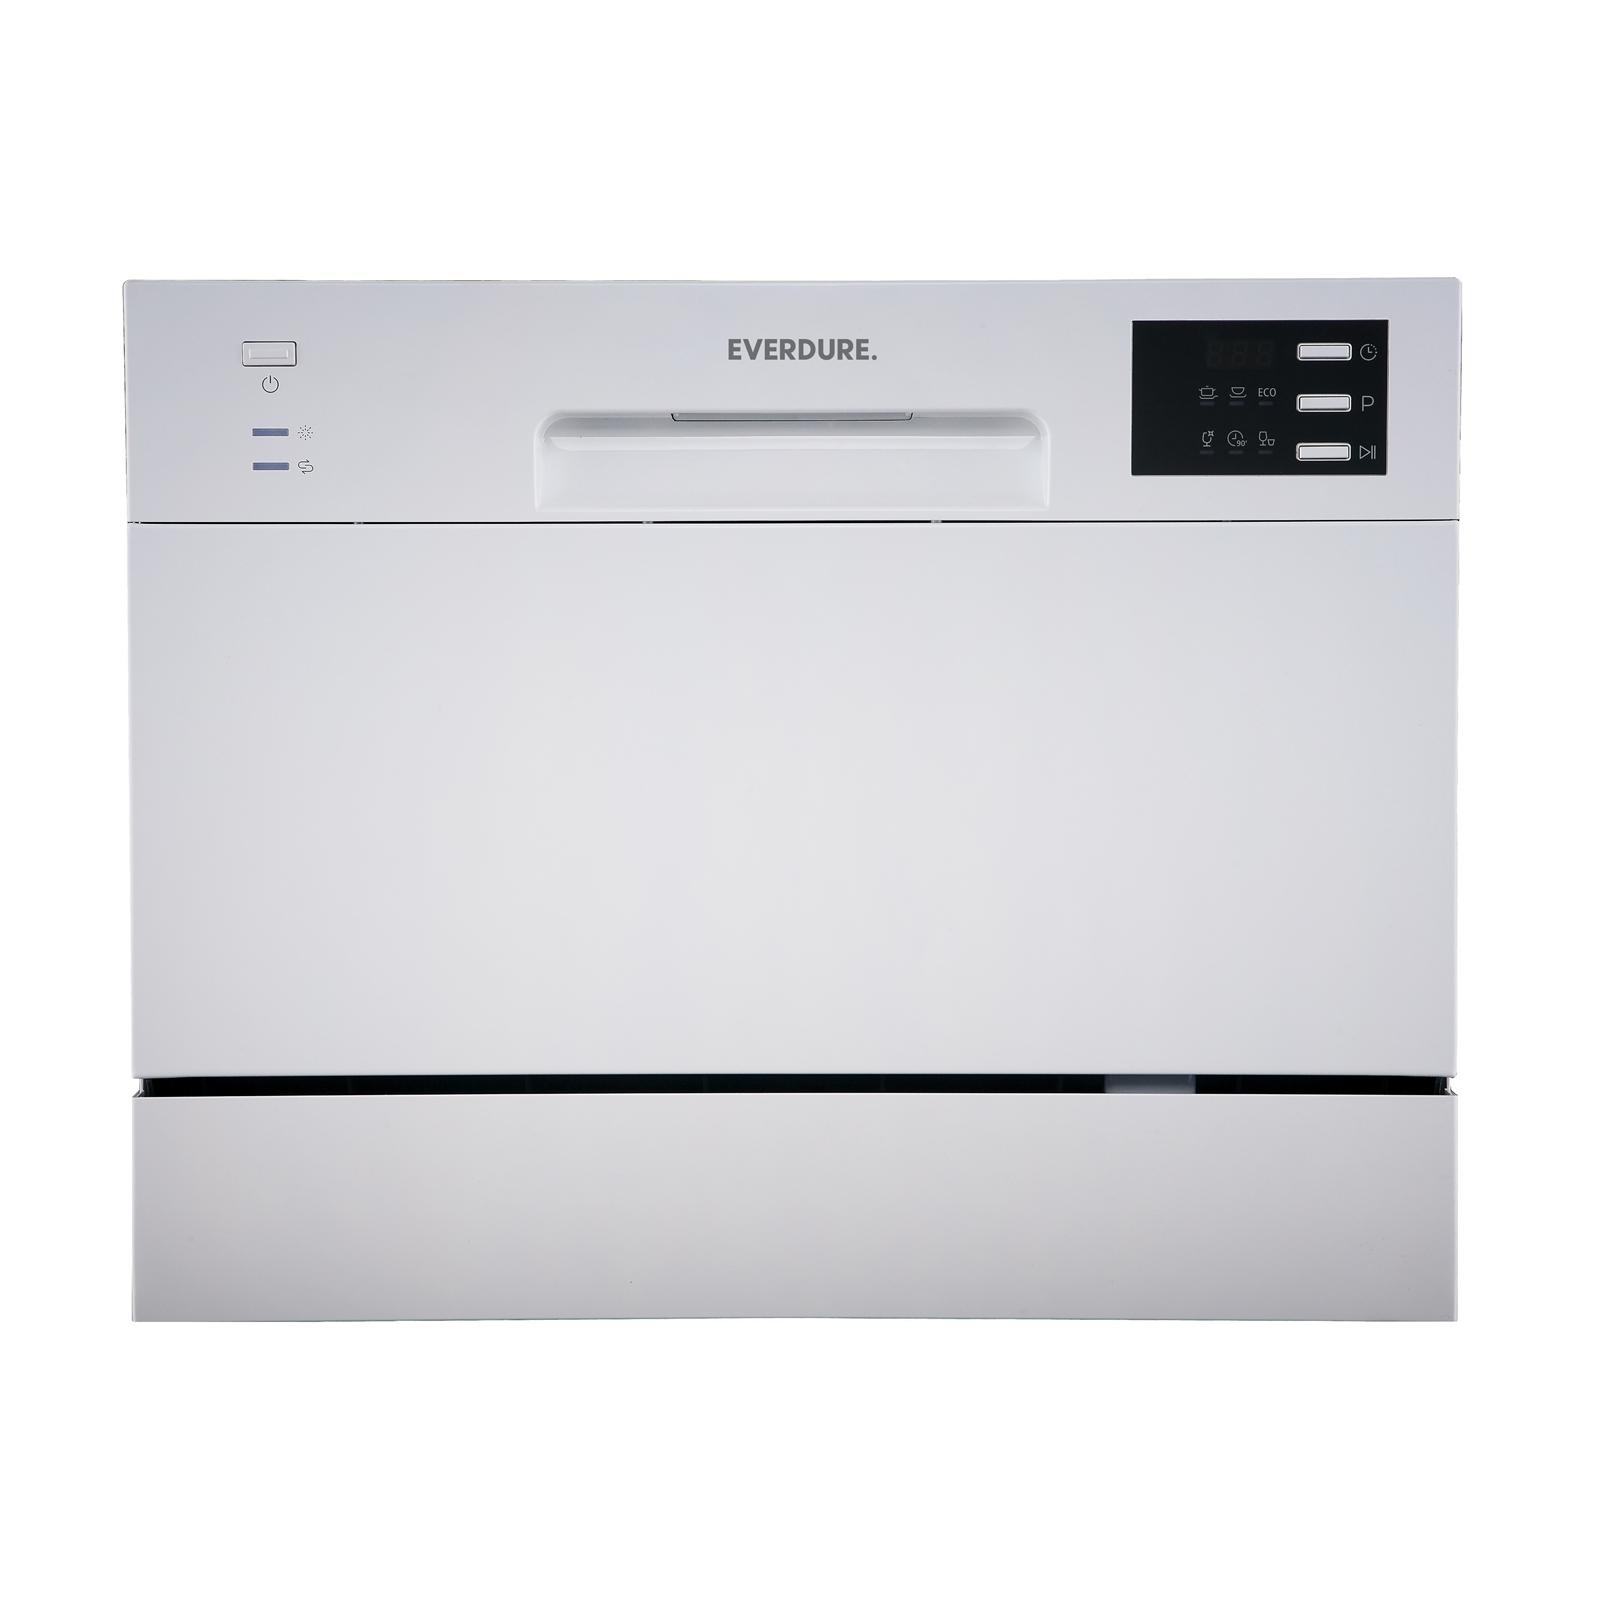 Everdure 55cm Silver Countertop Dishwasher